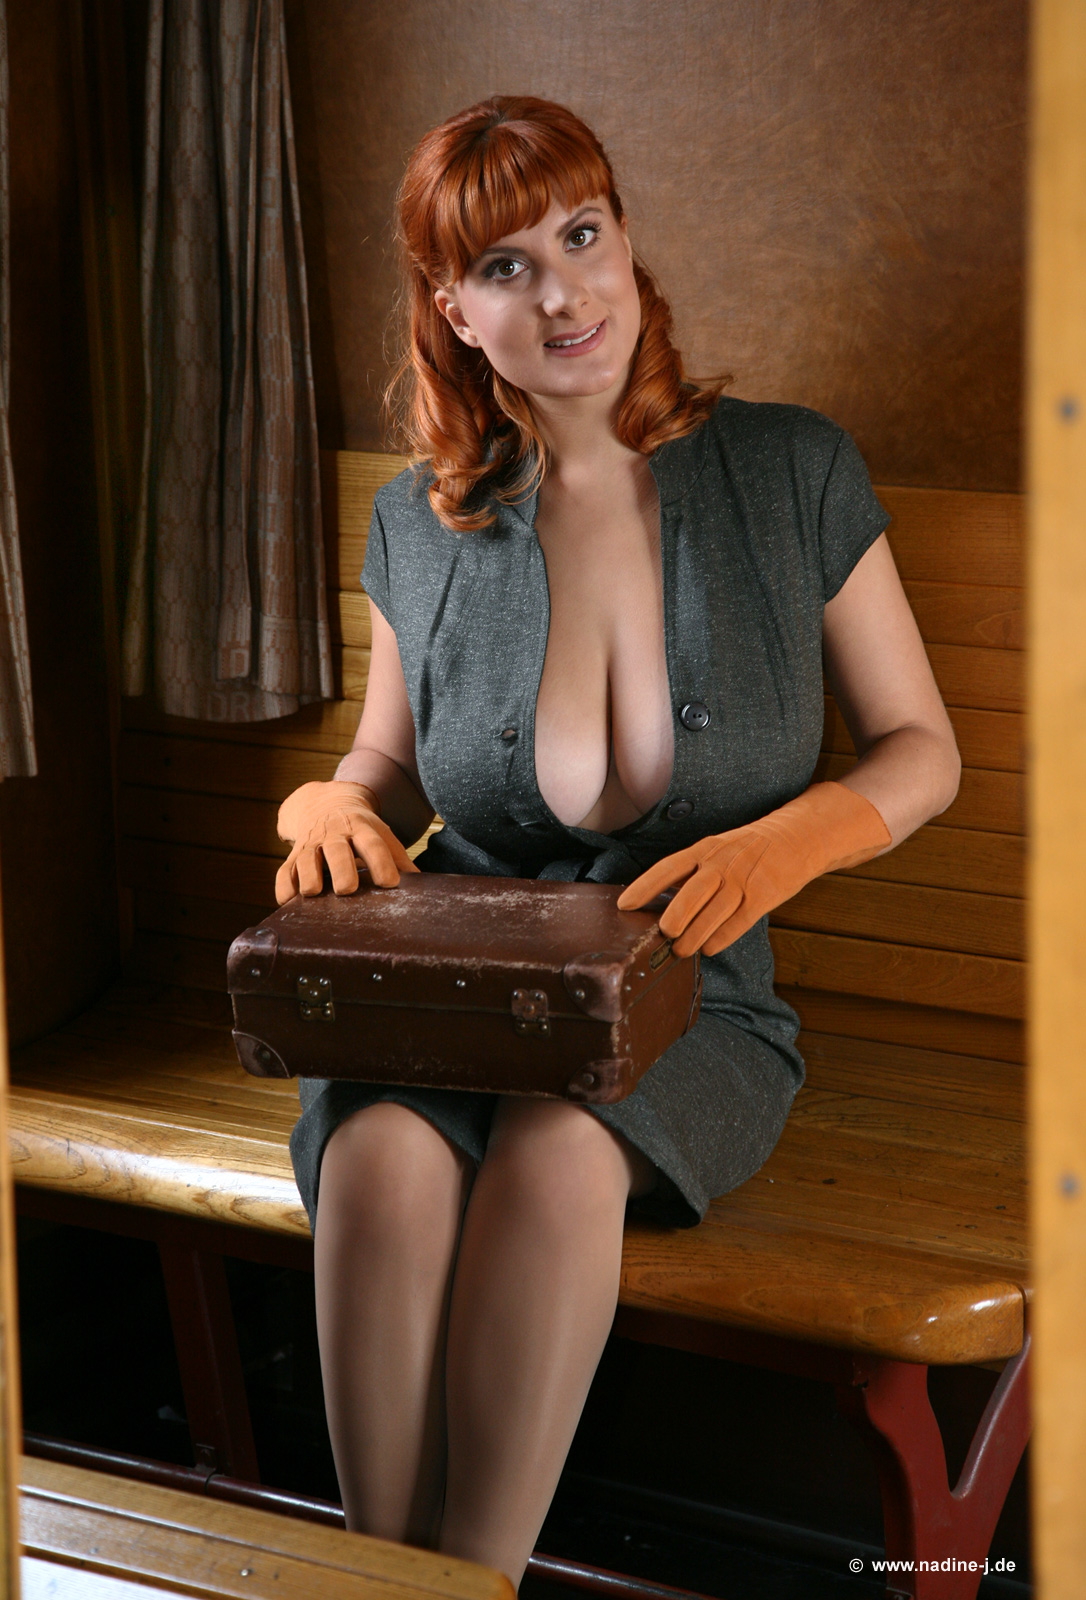 www.ebony xlgirls in panties.com